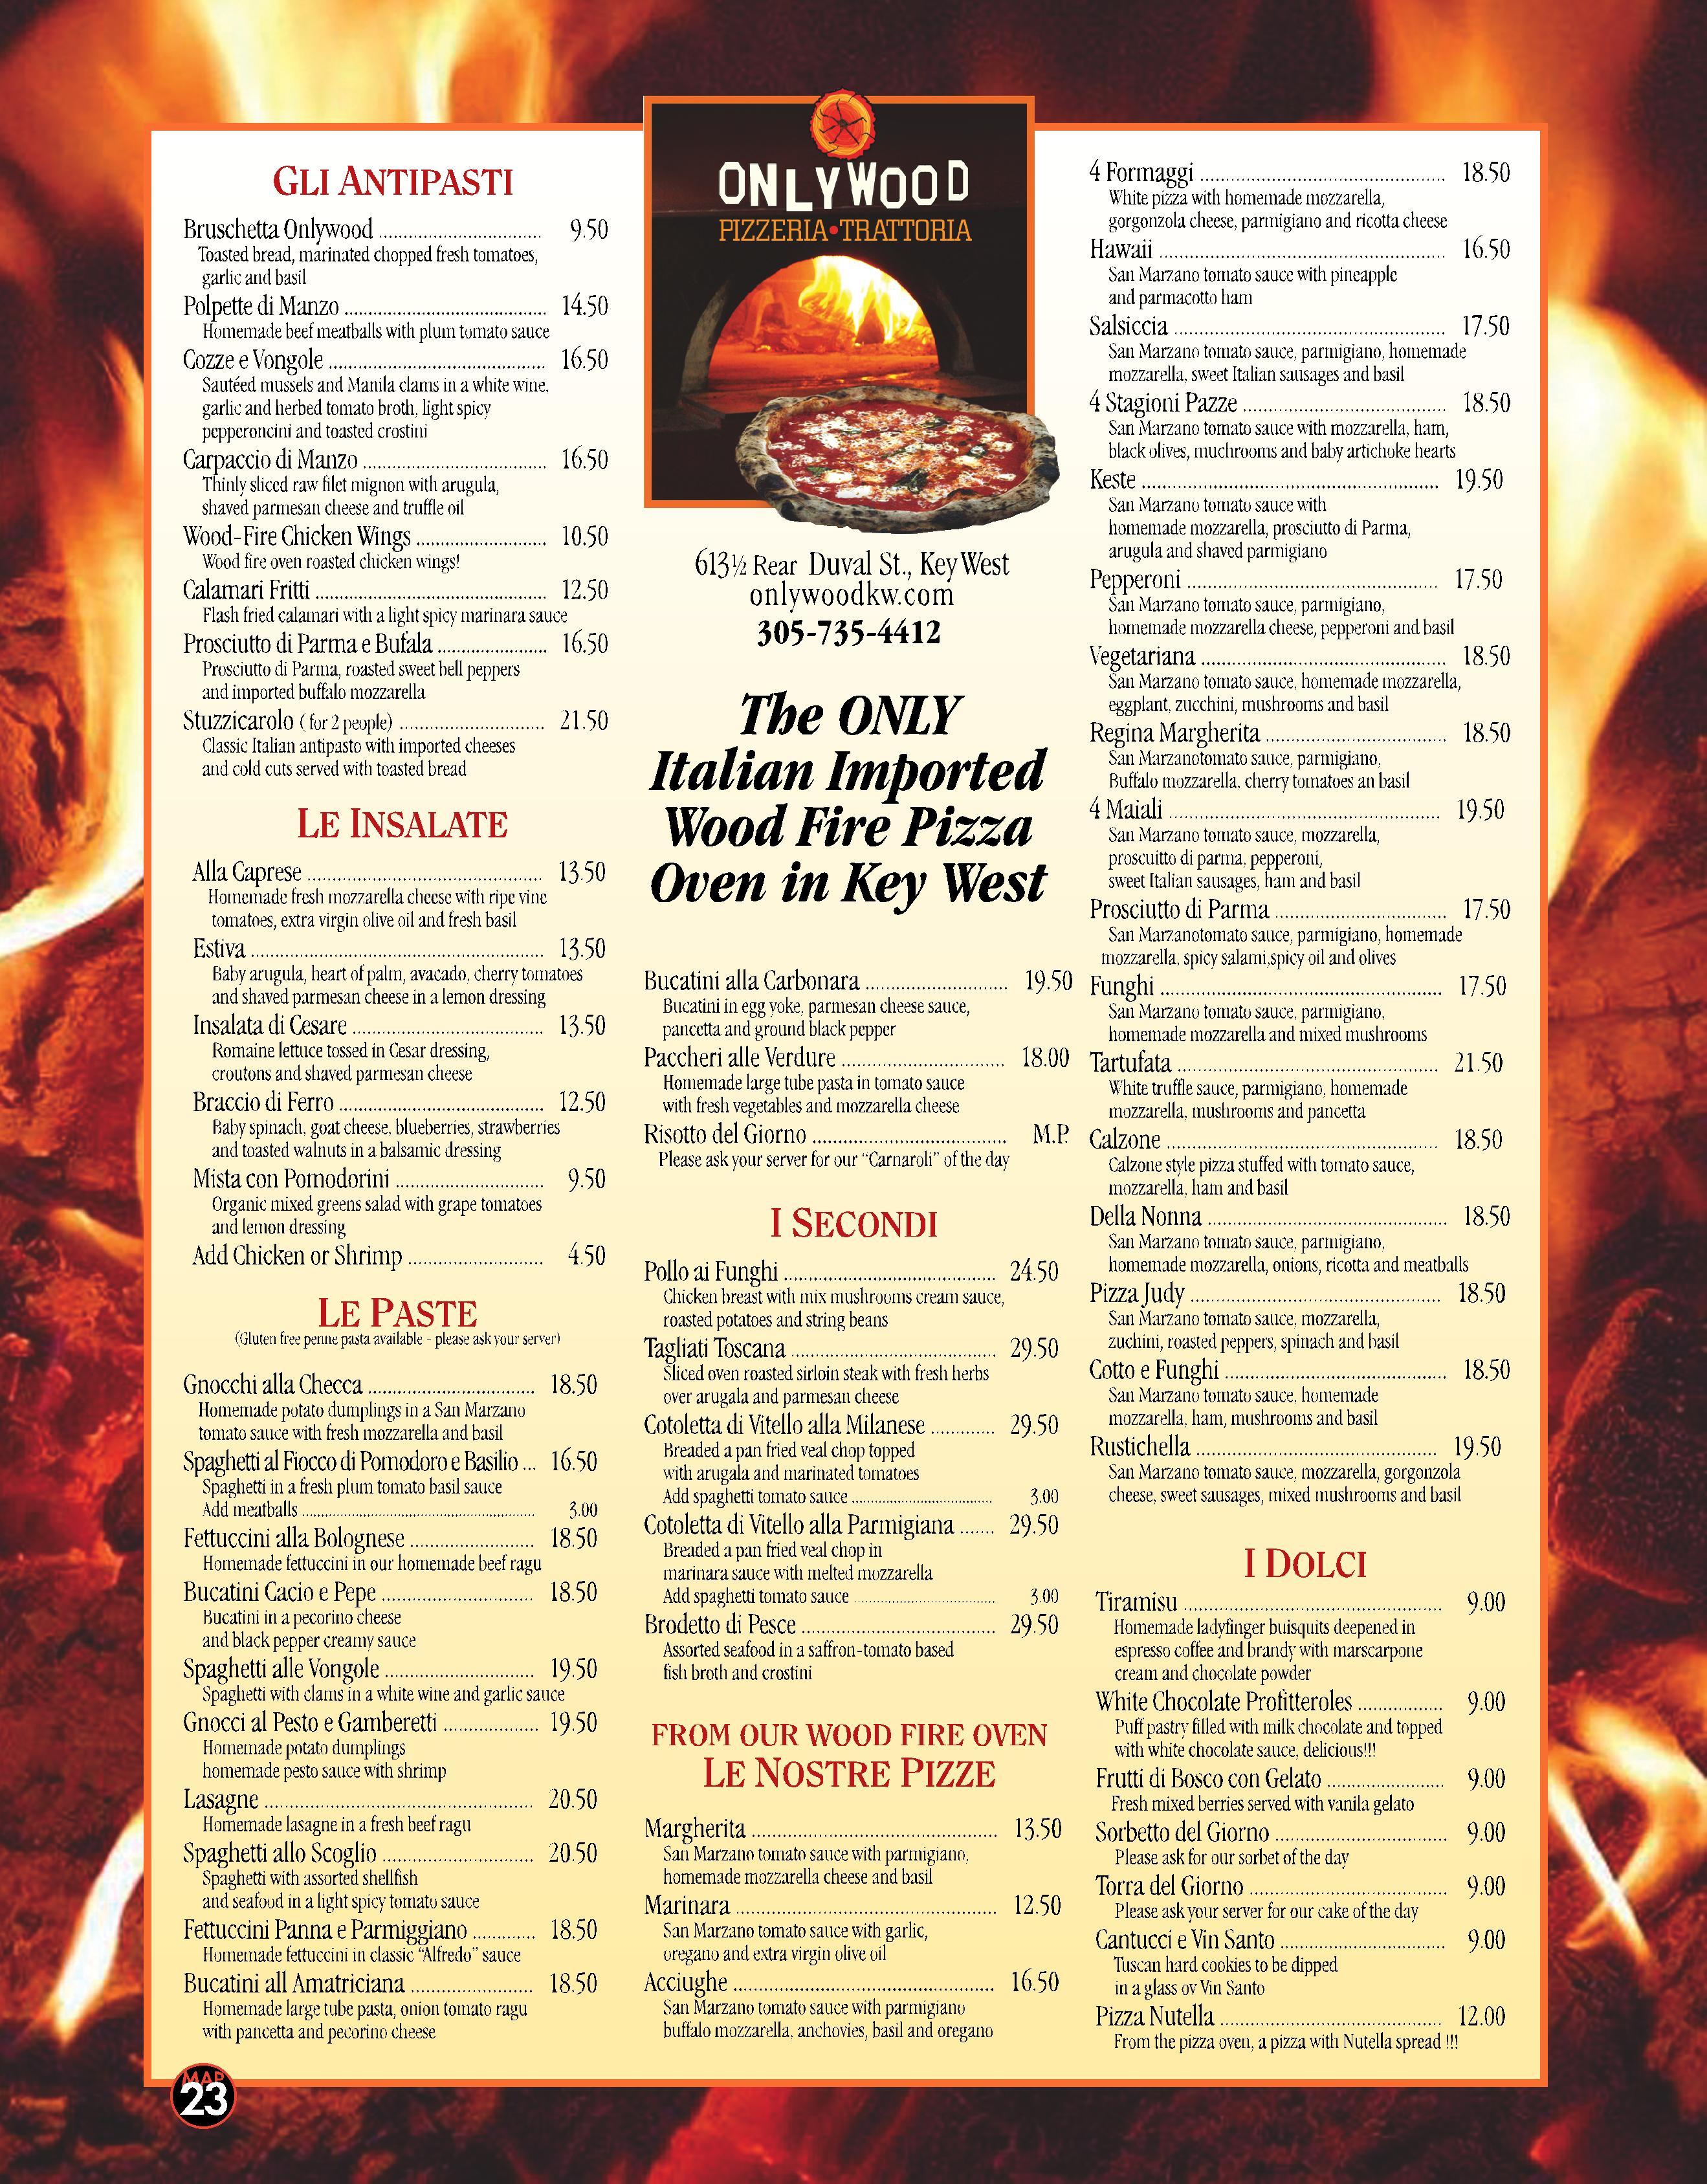 only wood pizzeria u2013 trattoria restaurant menu key west u2013 best